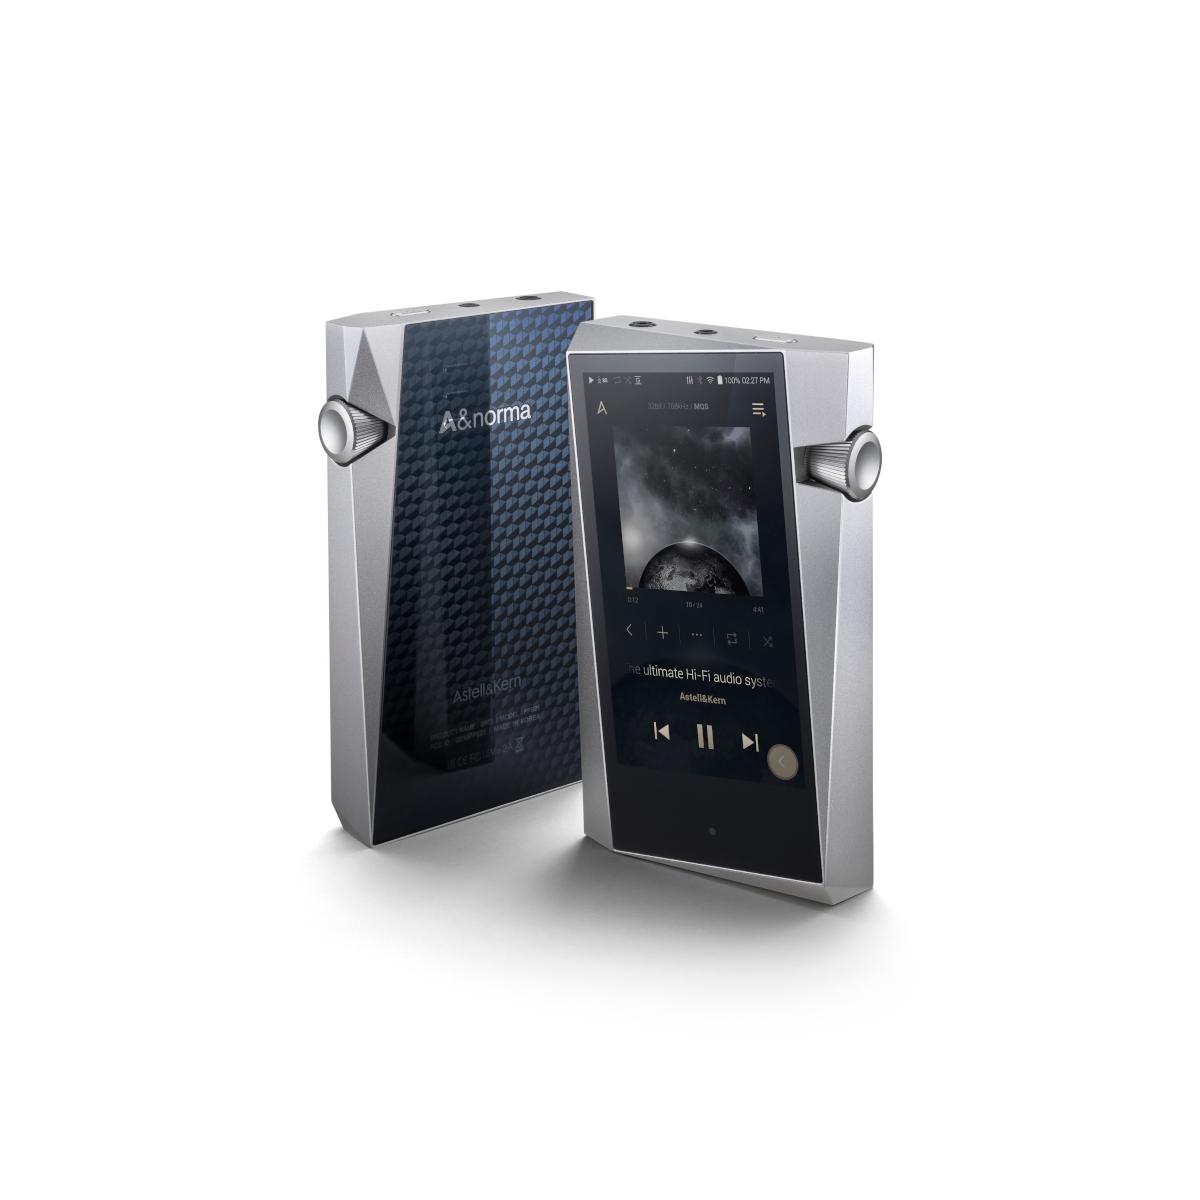 Astell & Kern SR25 Mobil Hi-Res. Player, moon silver